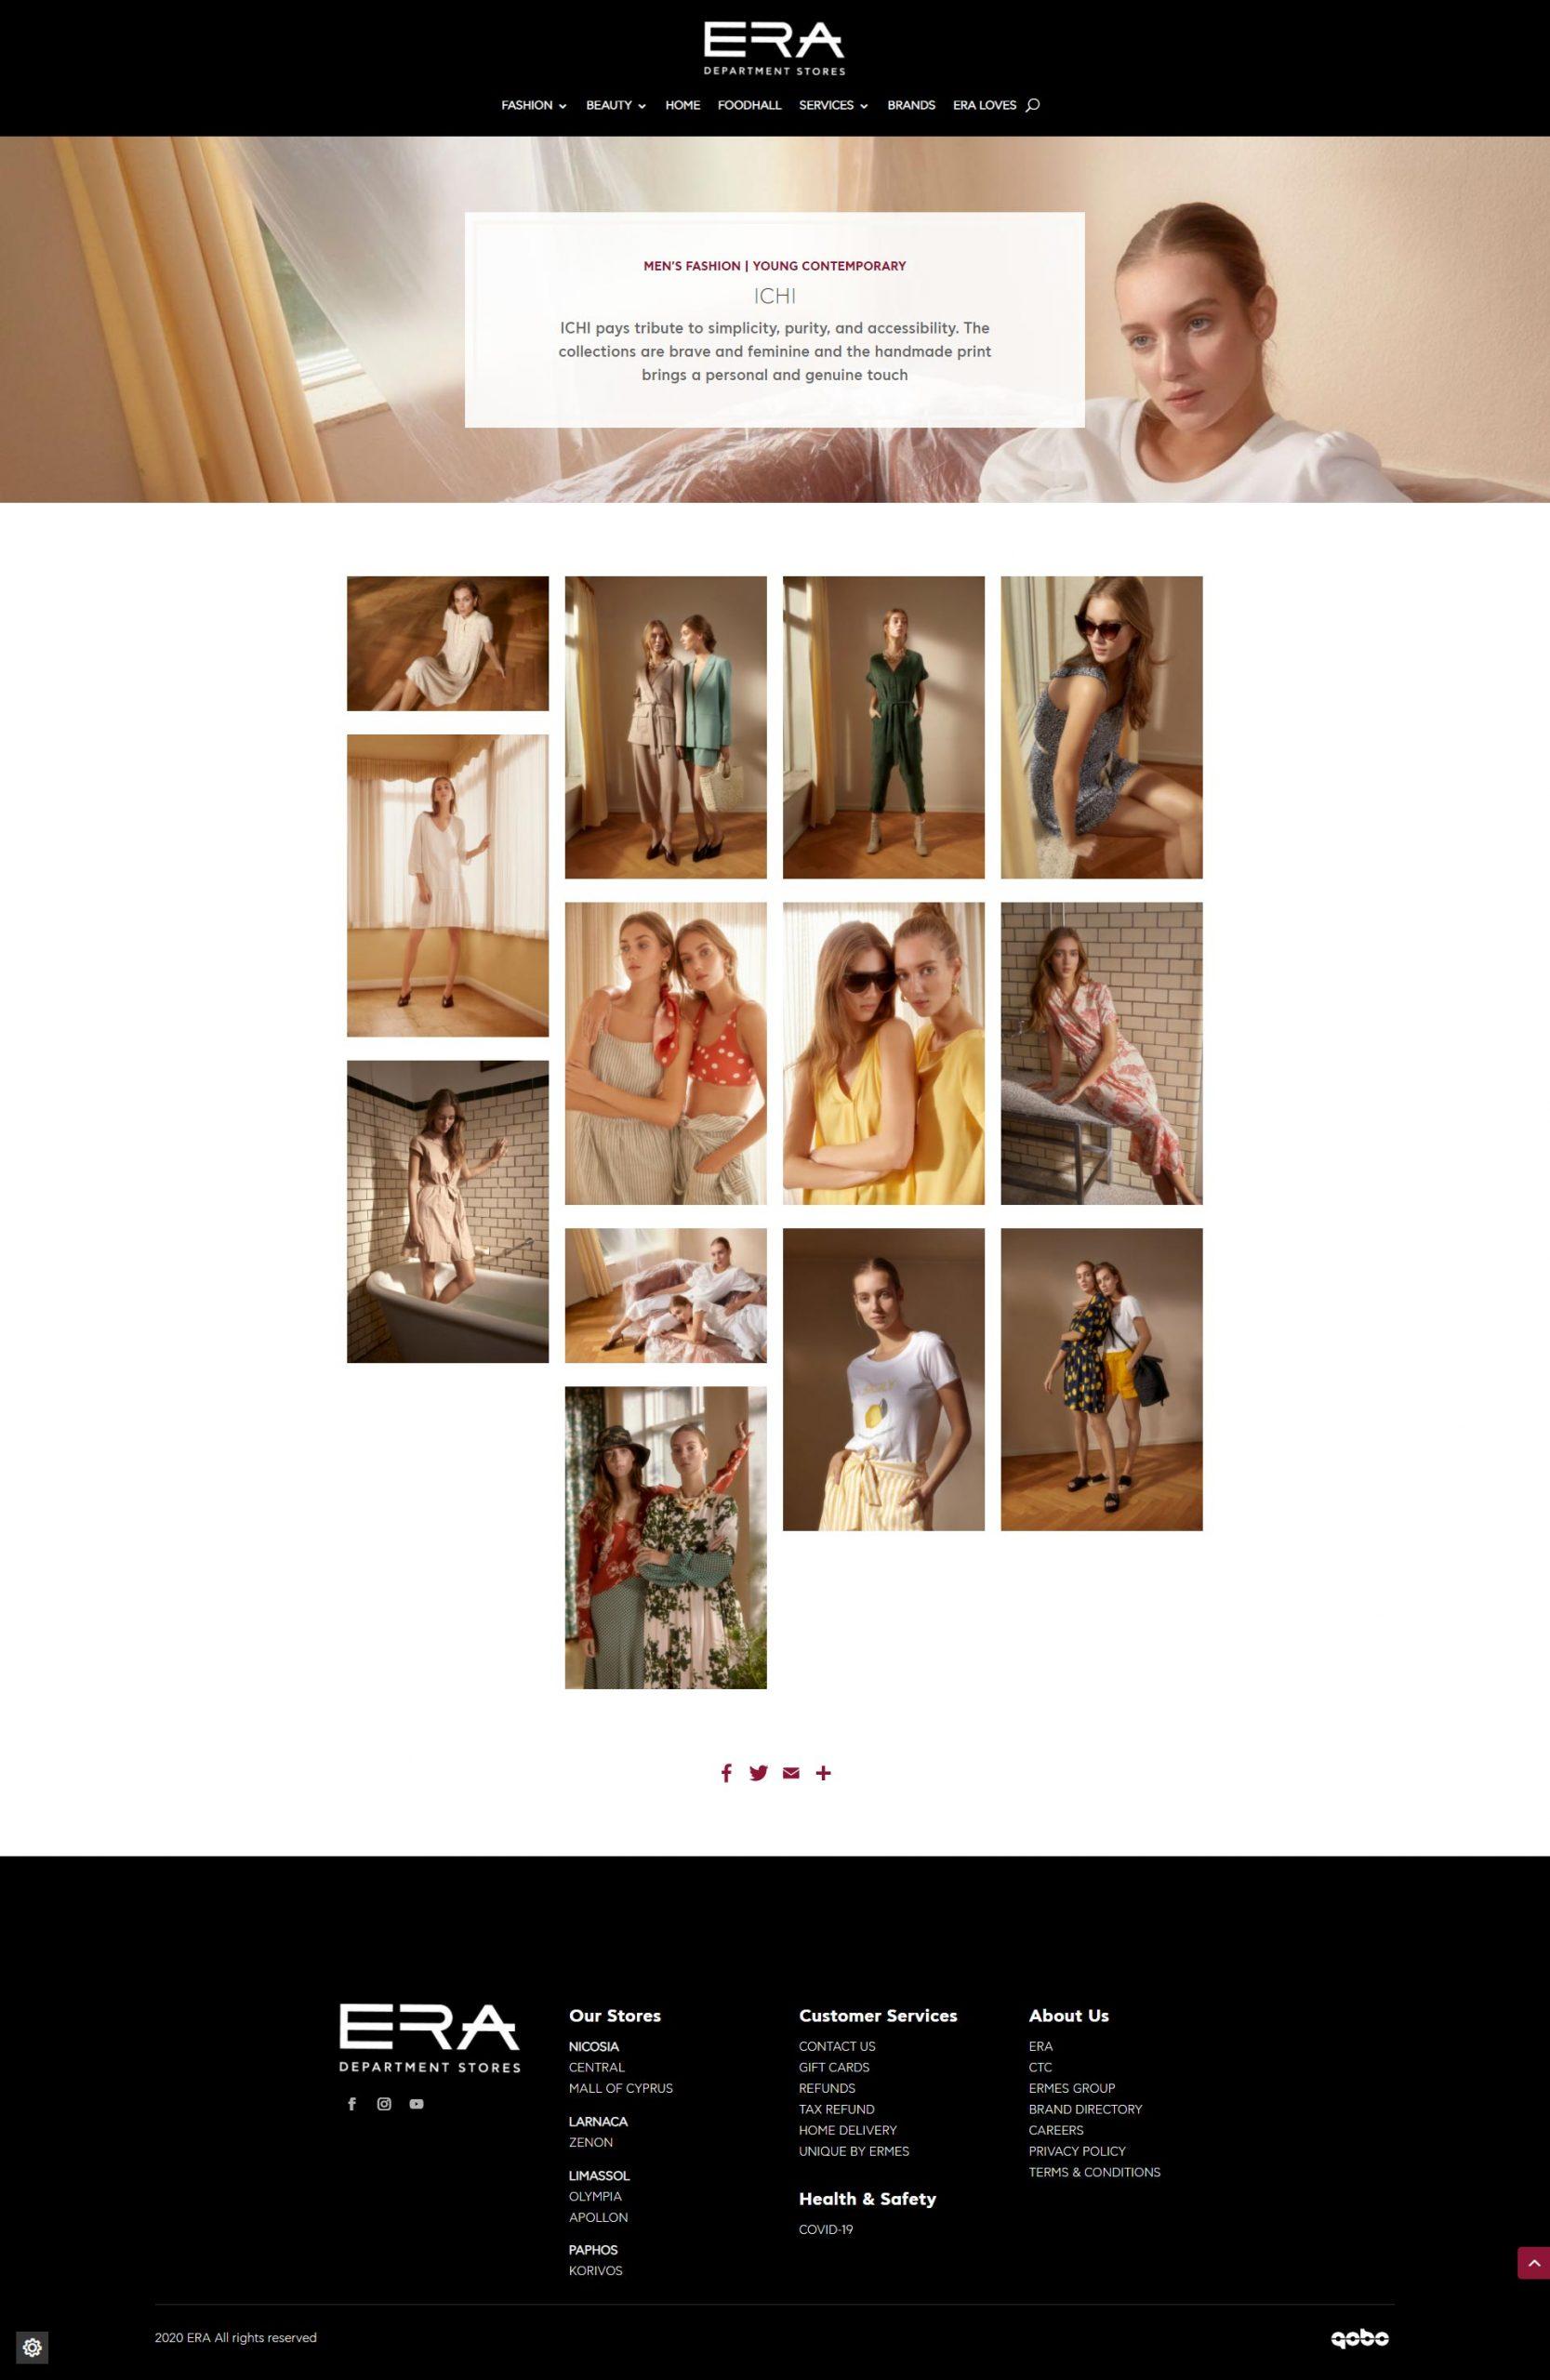 ERA Cyprus Website Design focused on aesthetics and editorial theme